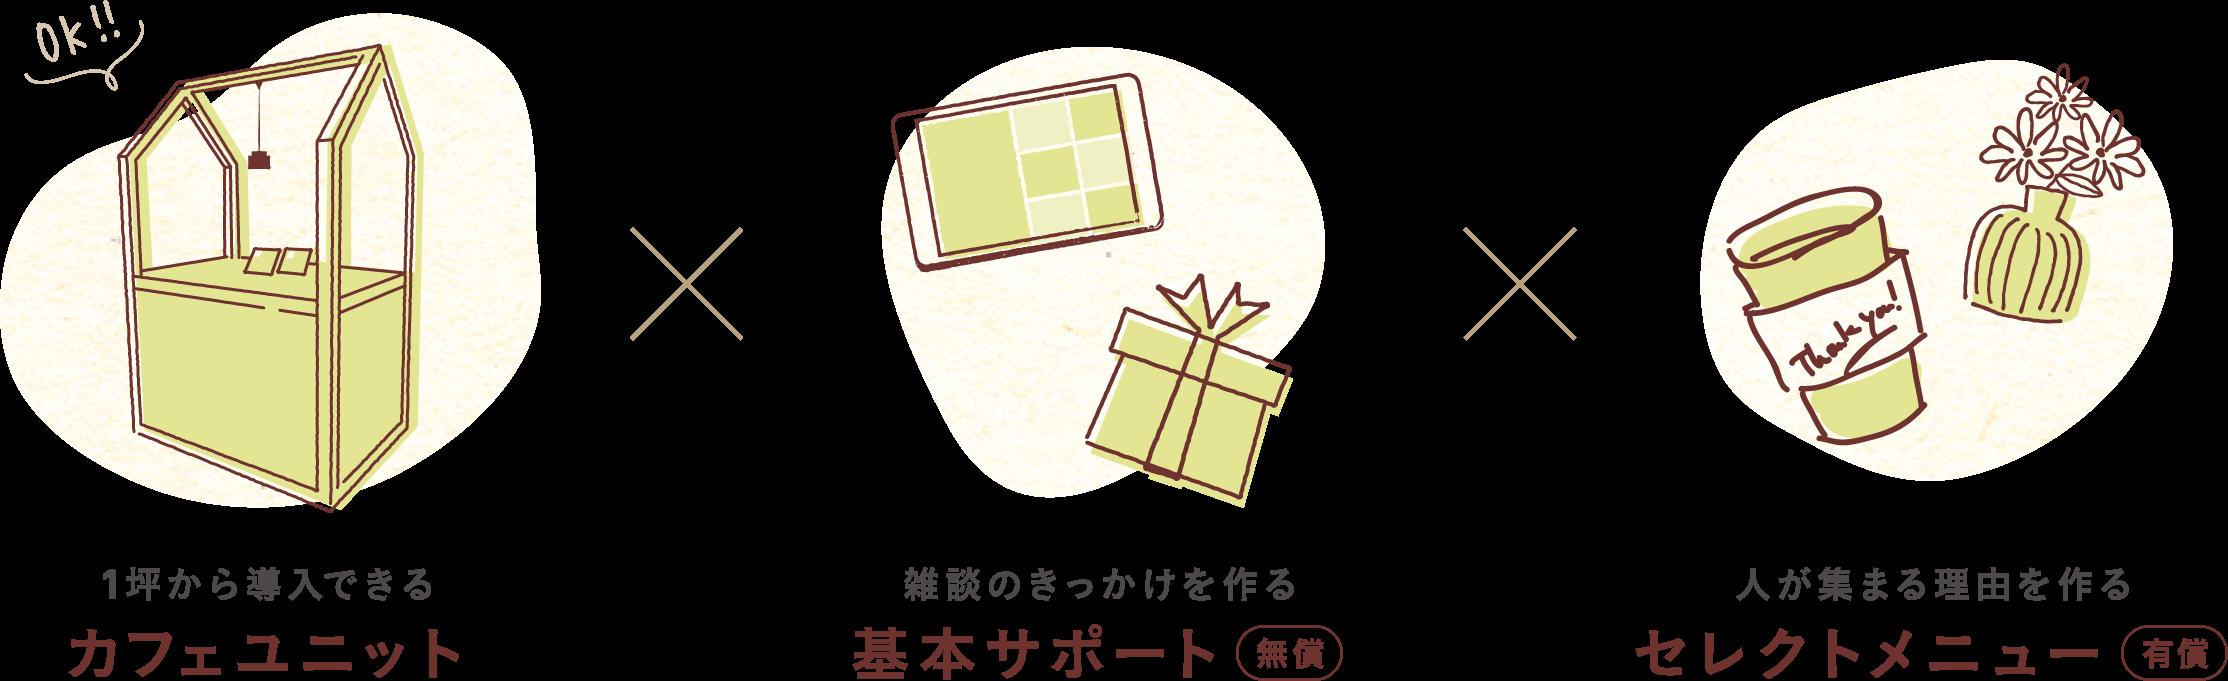 5 TSUBO CAFEの基本構成イラスト